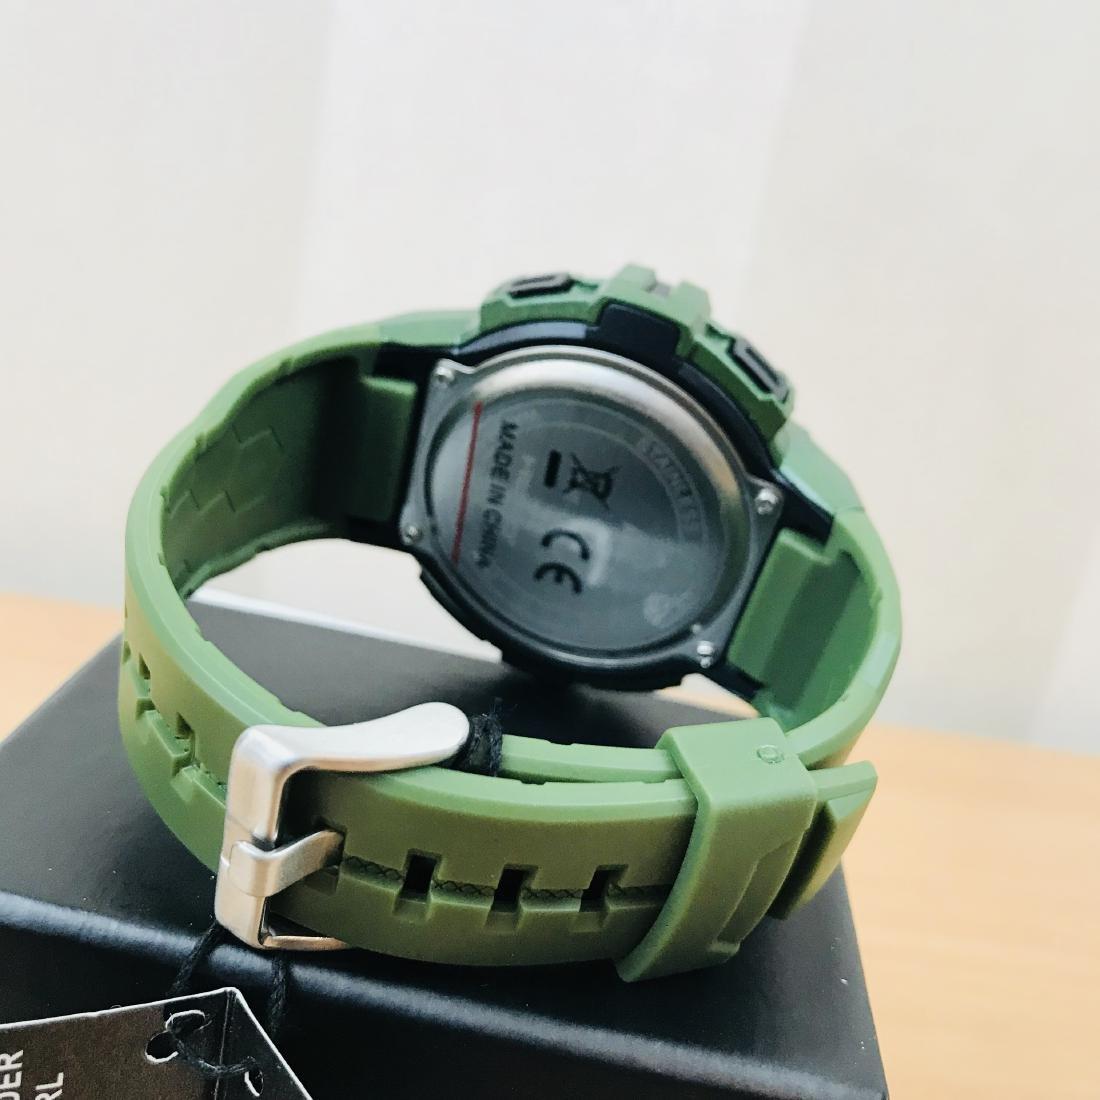 HEAD Super G Green Multifunctional Watch - 3